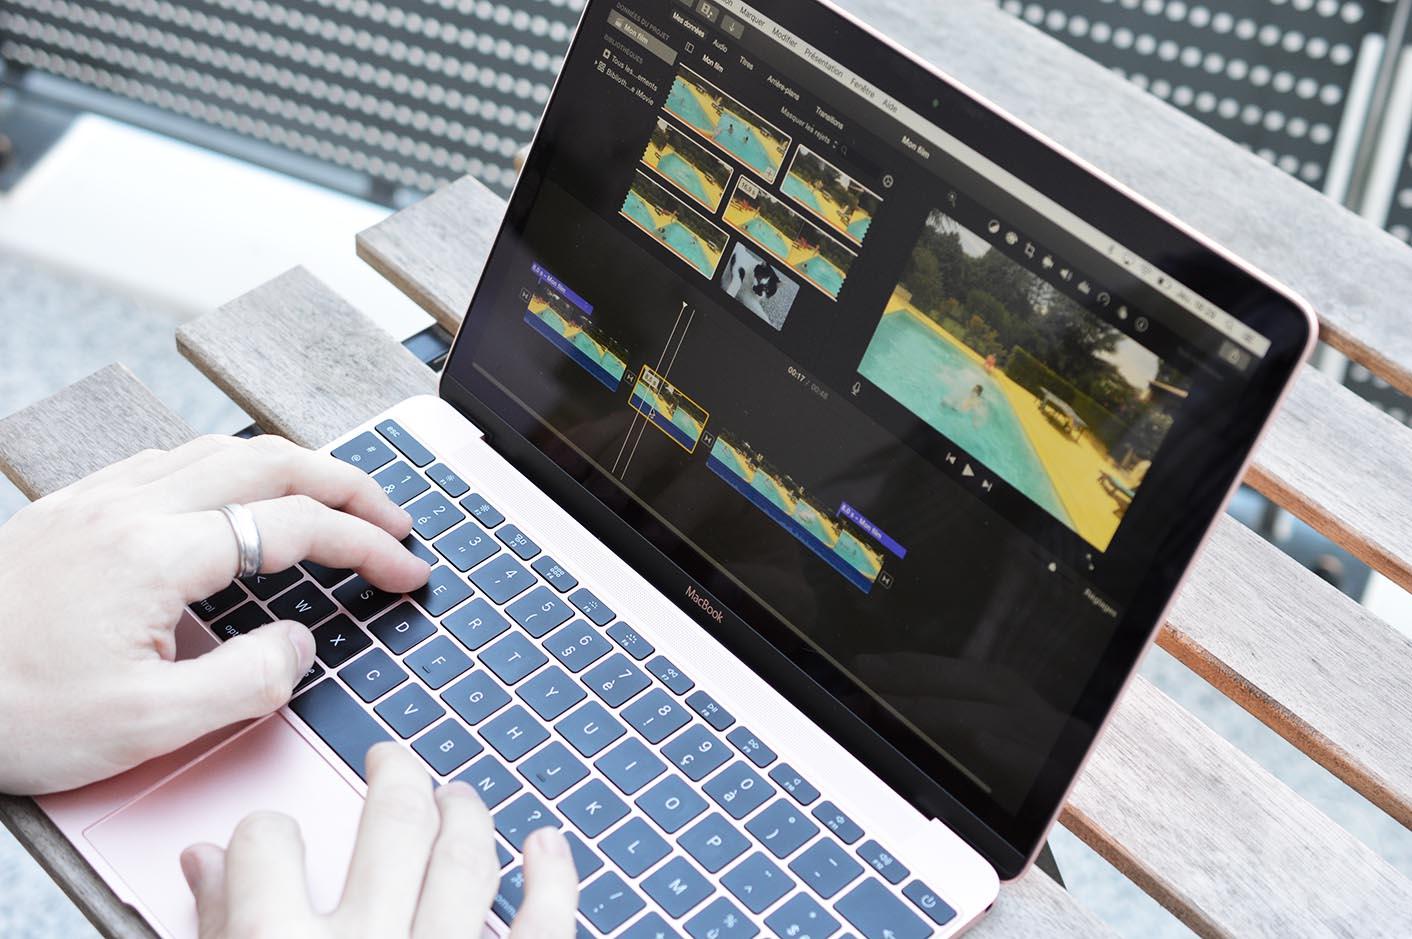 MacBook 2016 iMovie